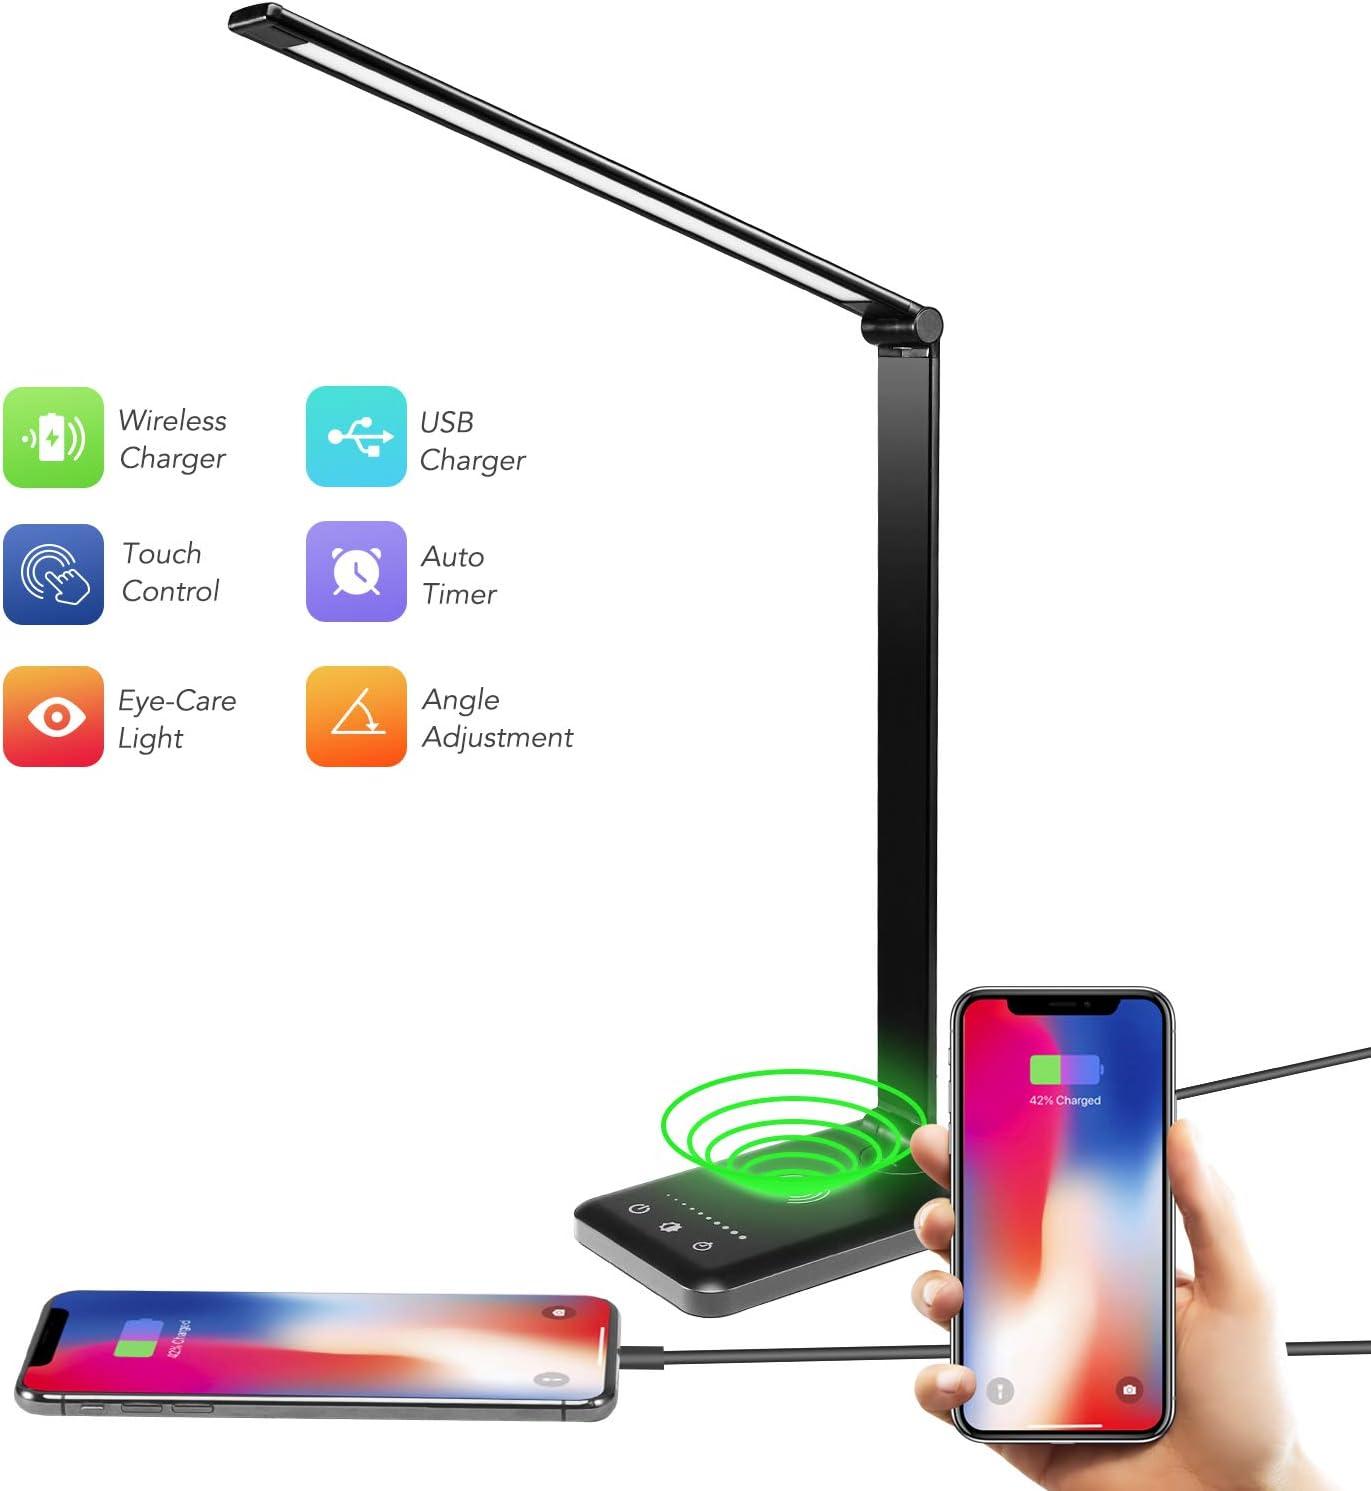 Acko Desk Lamp,Led Desk Lamp with USB Charging Port,Wireless Charging Lamp,5 Lighting Modes,5 Brightness Levels, Sensitive Control, 30/60 min Auto Timer,Office Desk Lamp Eye Care